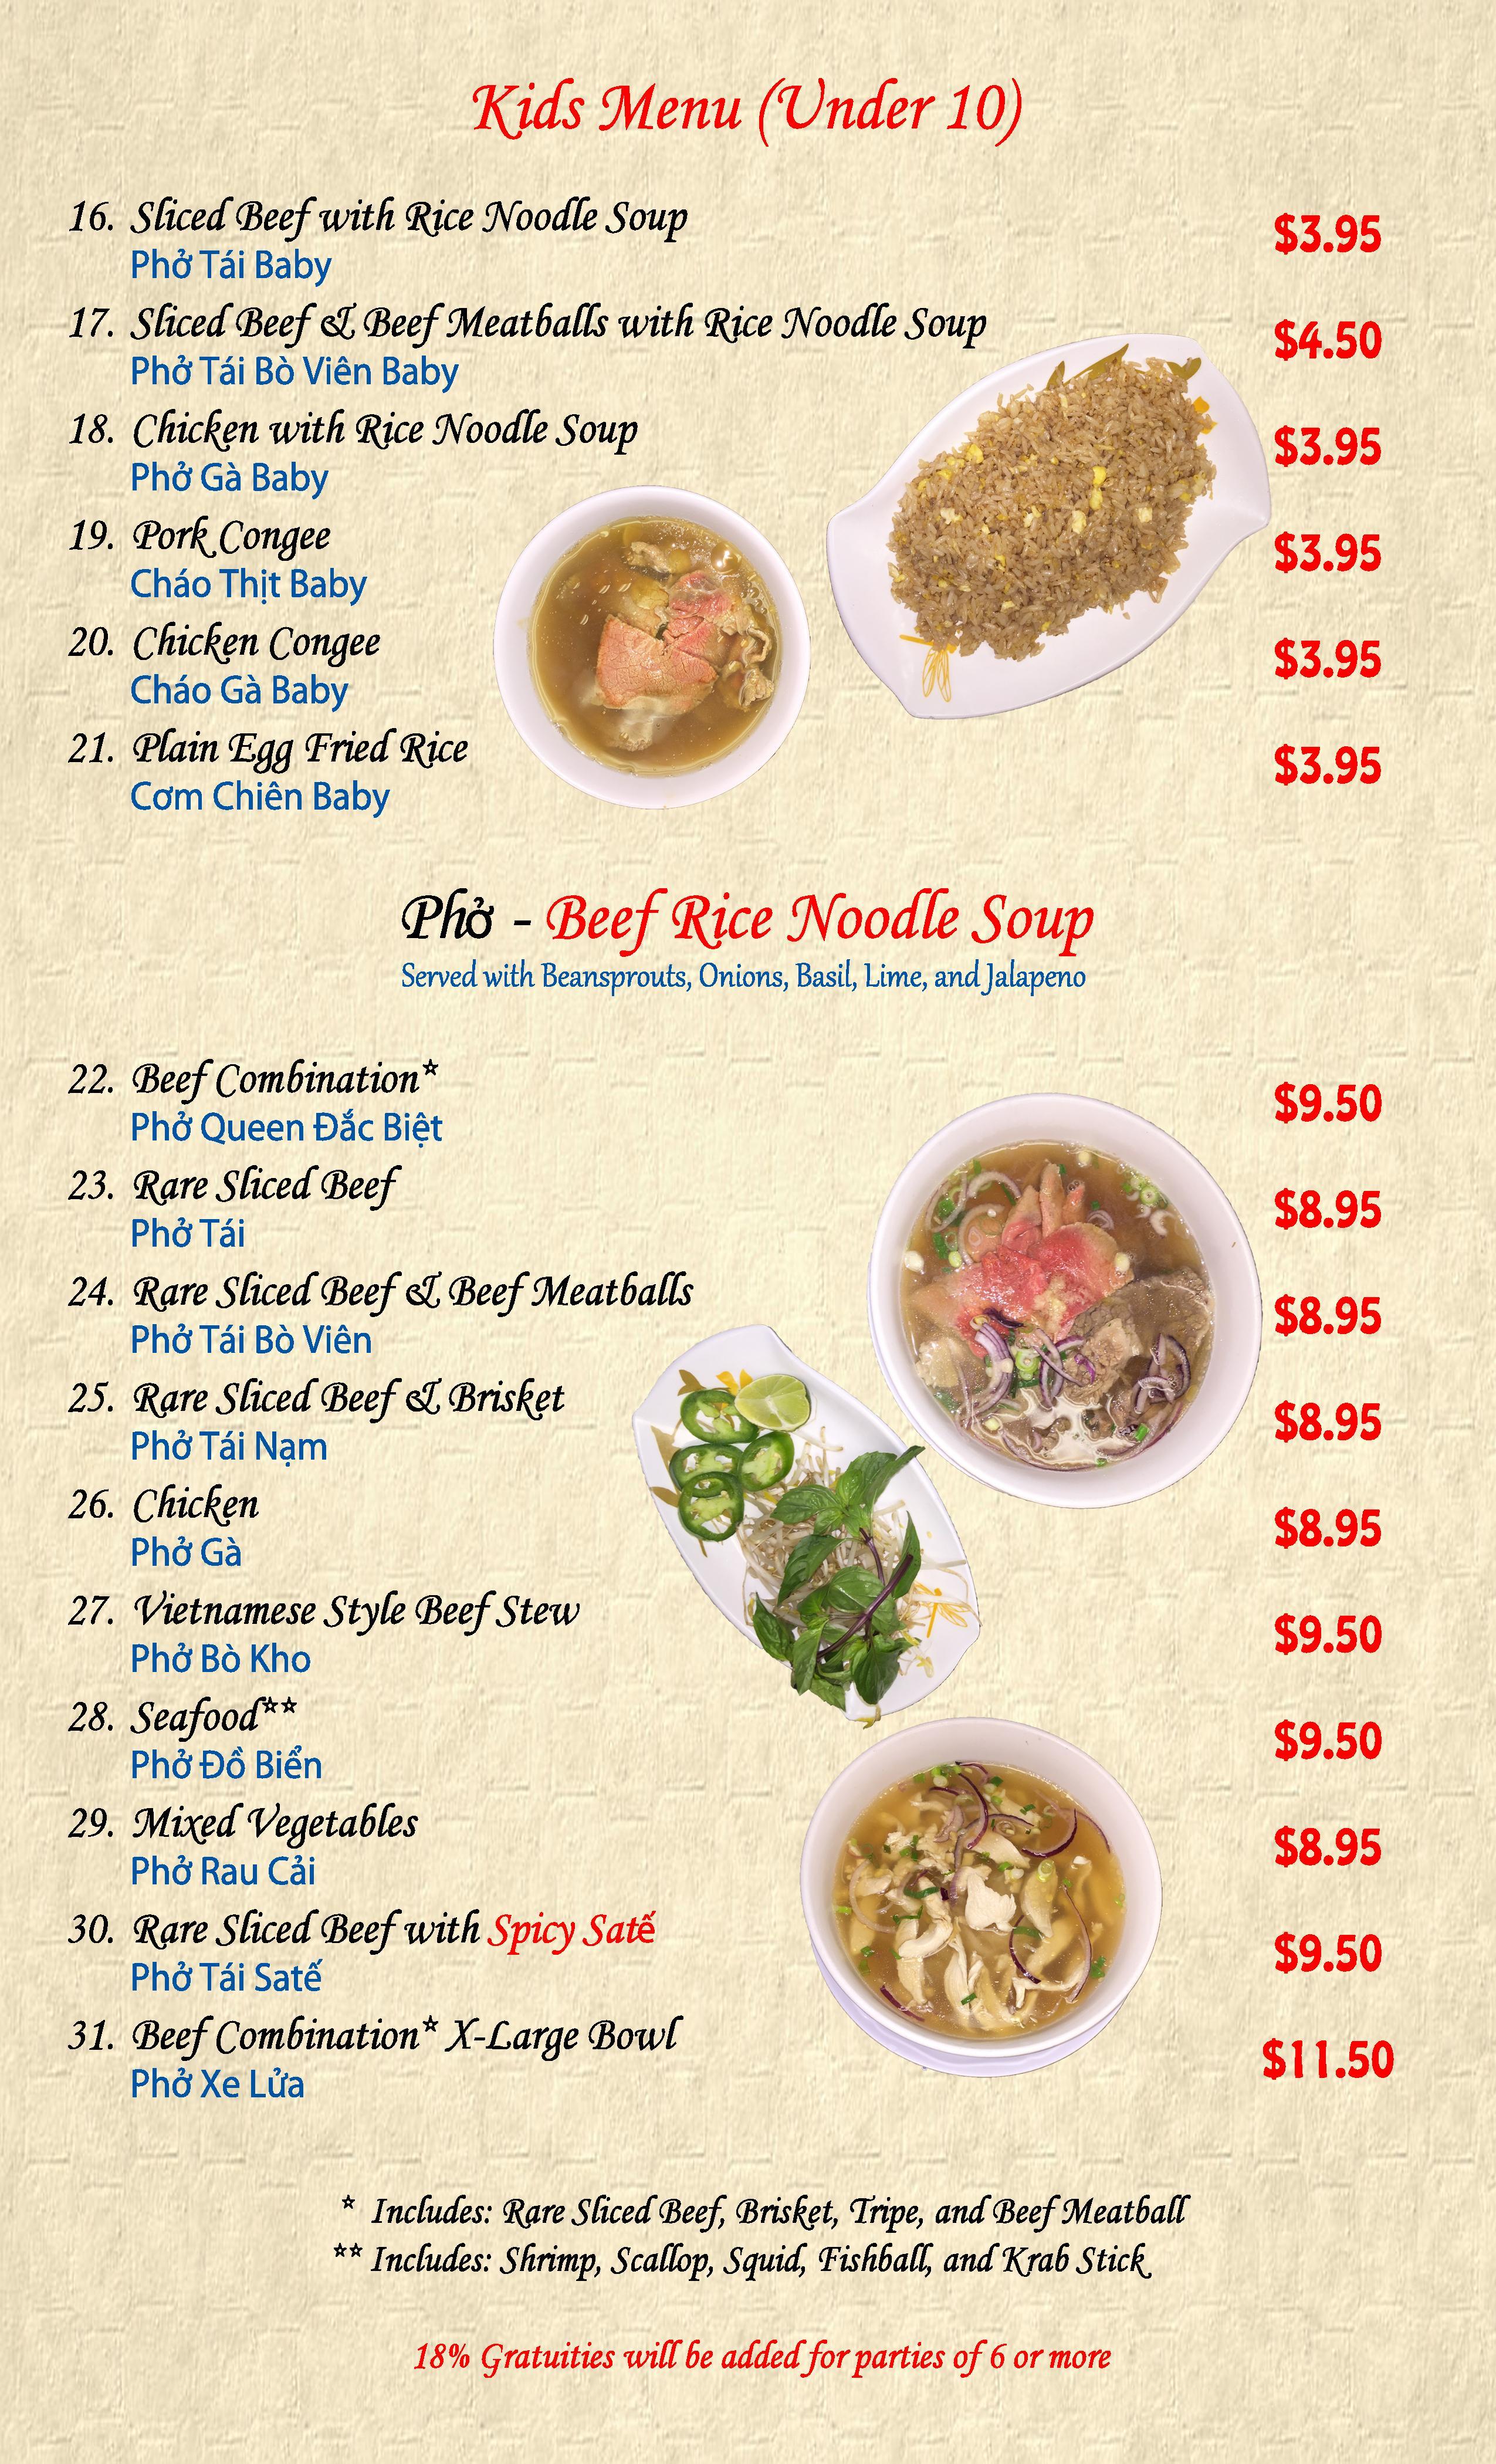 Beef Pho Calories Large Bowl